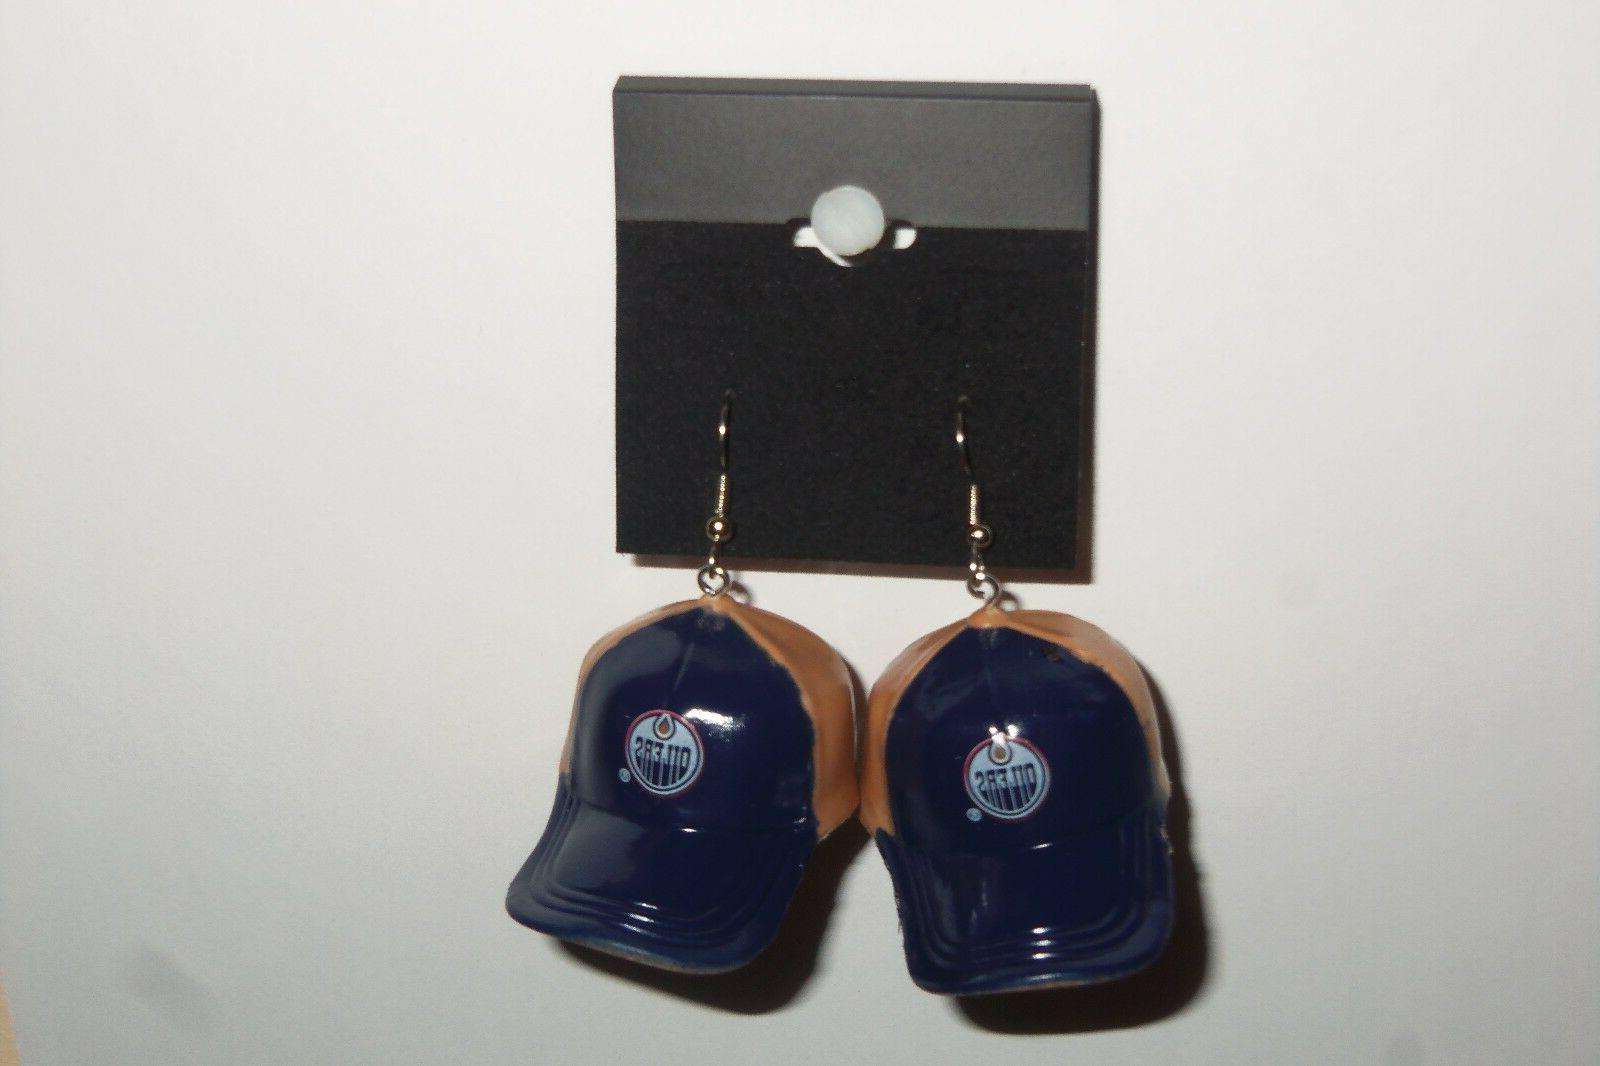 nhl edmonton oilers dangling earrings mini 2